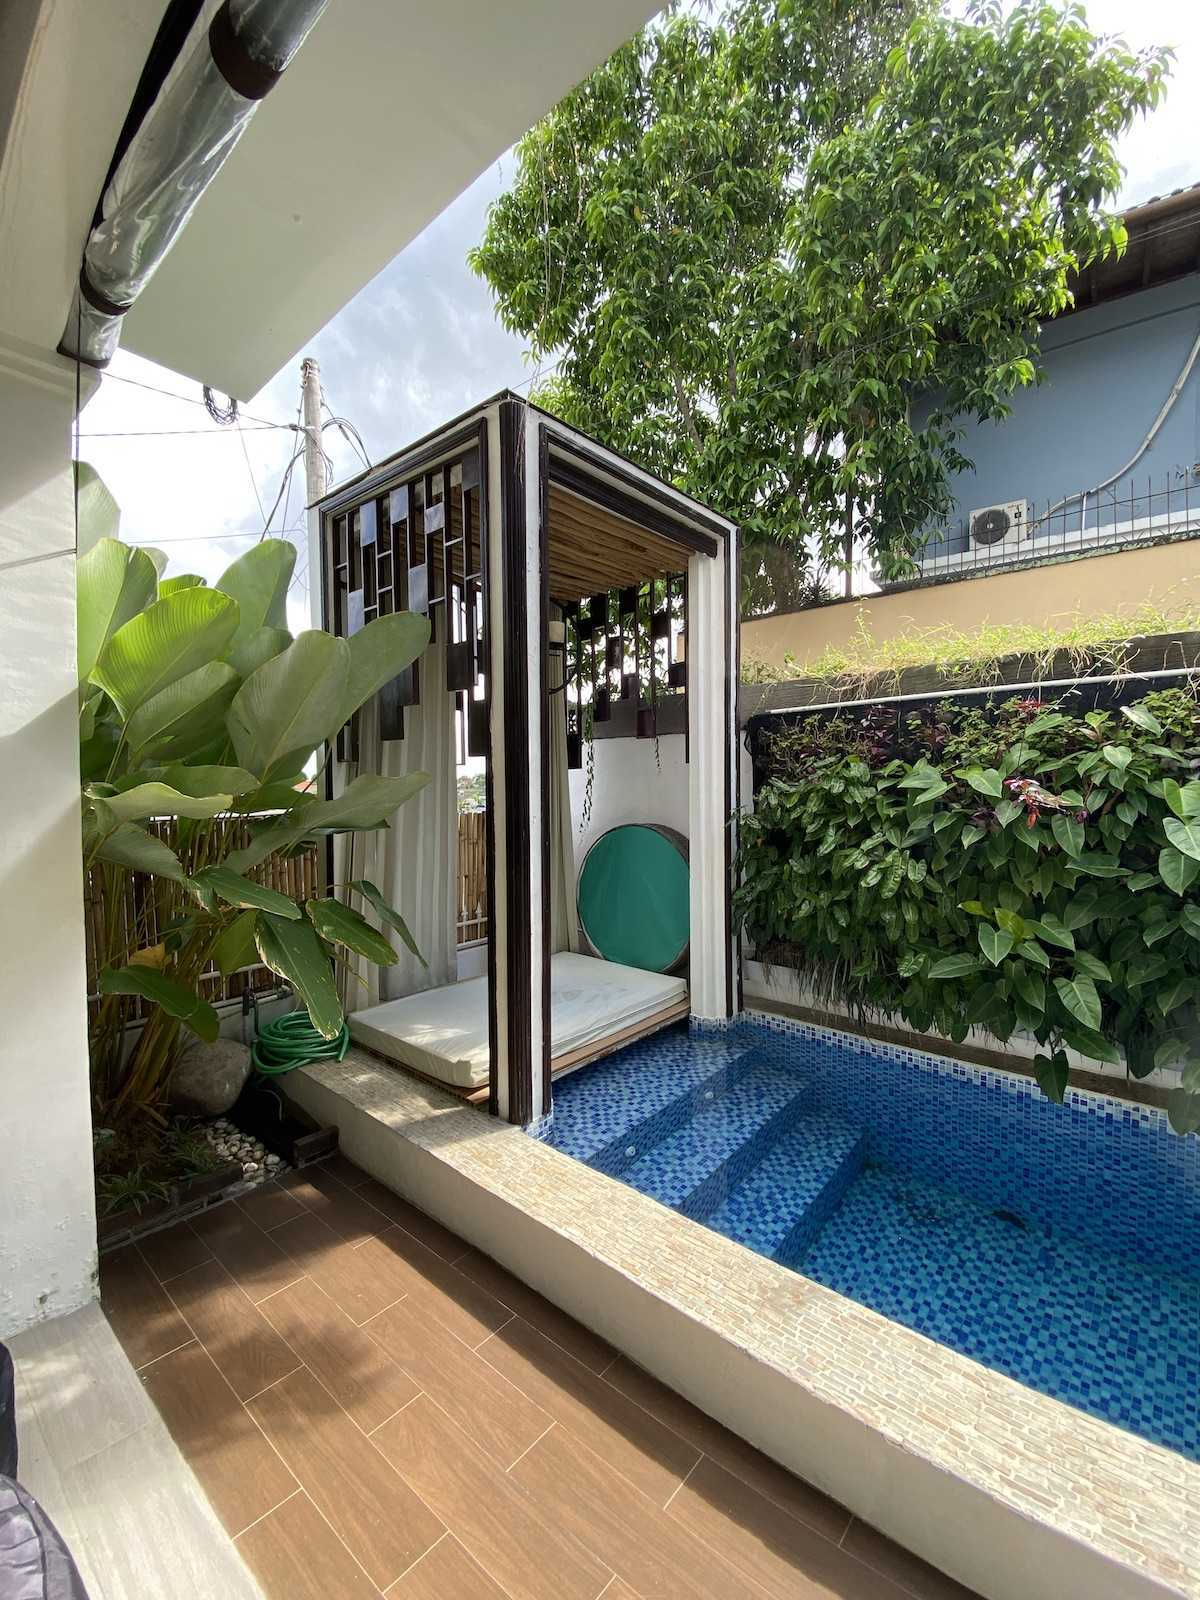 Studio Asri Jalak House Canggu, Kec. Kuta Utara, Kabupaten Badung, Bali, Indonesia Canggu, Kec. Kuta Utara, Kabupaten Badung, Bali, Indonesia Studio-Asri-Jalak-House   98855